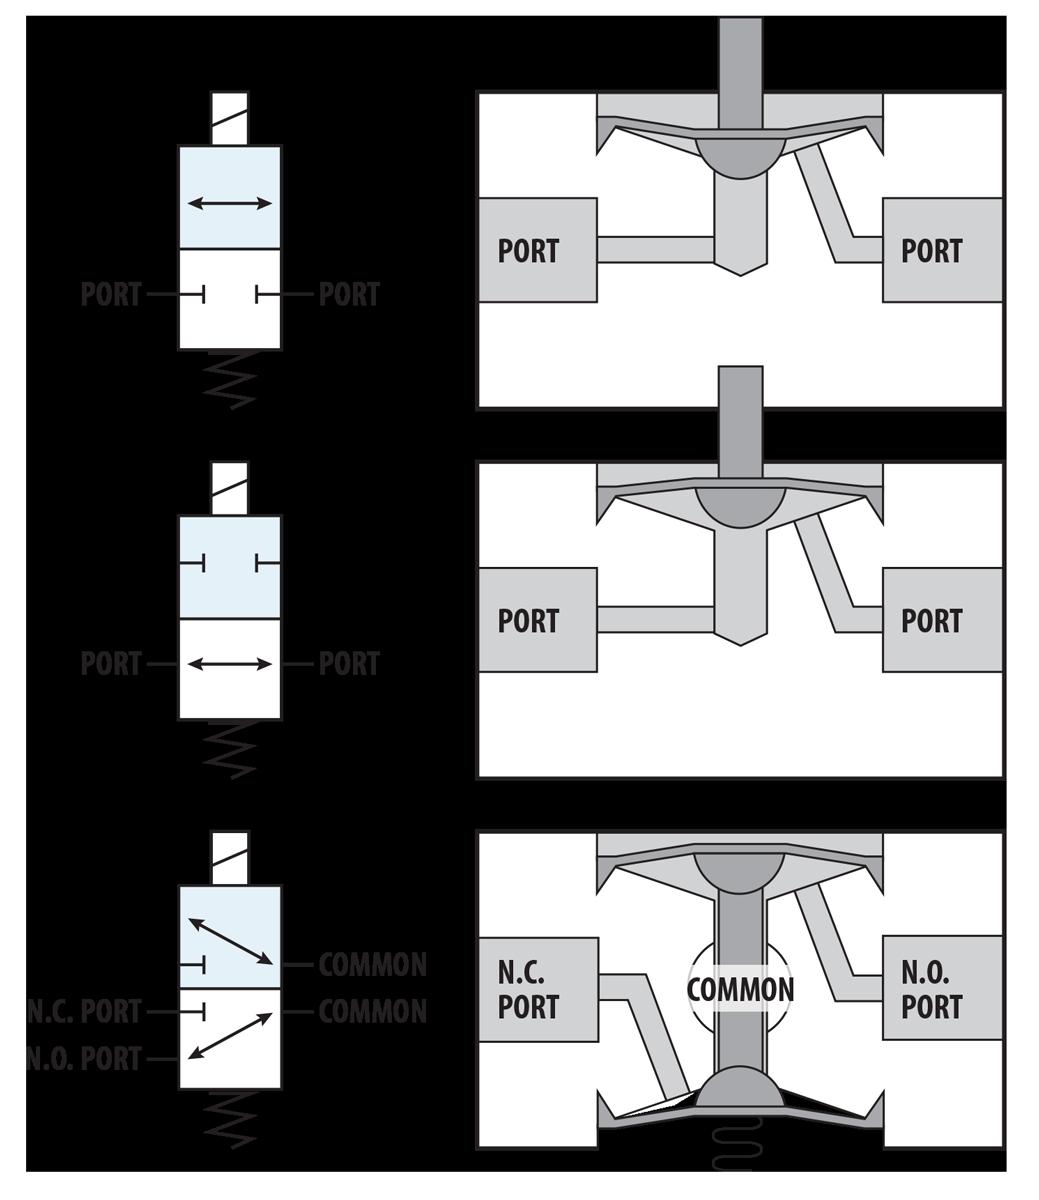 NIV Series PTFE Isolation Valves Schematics